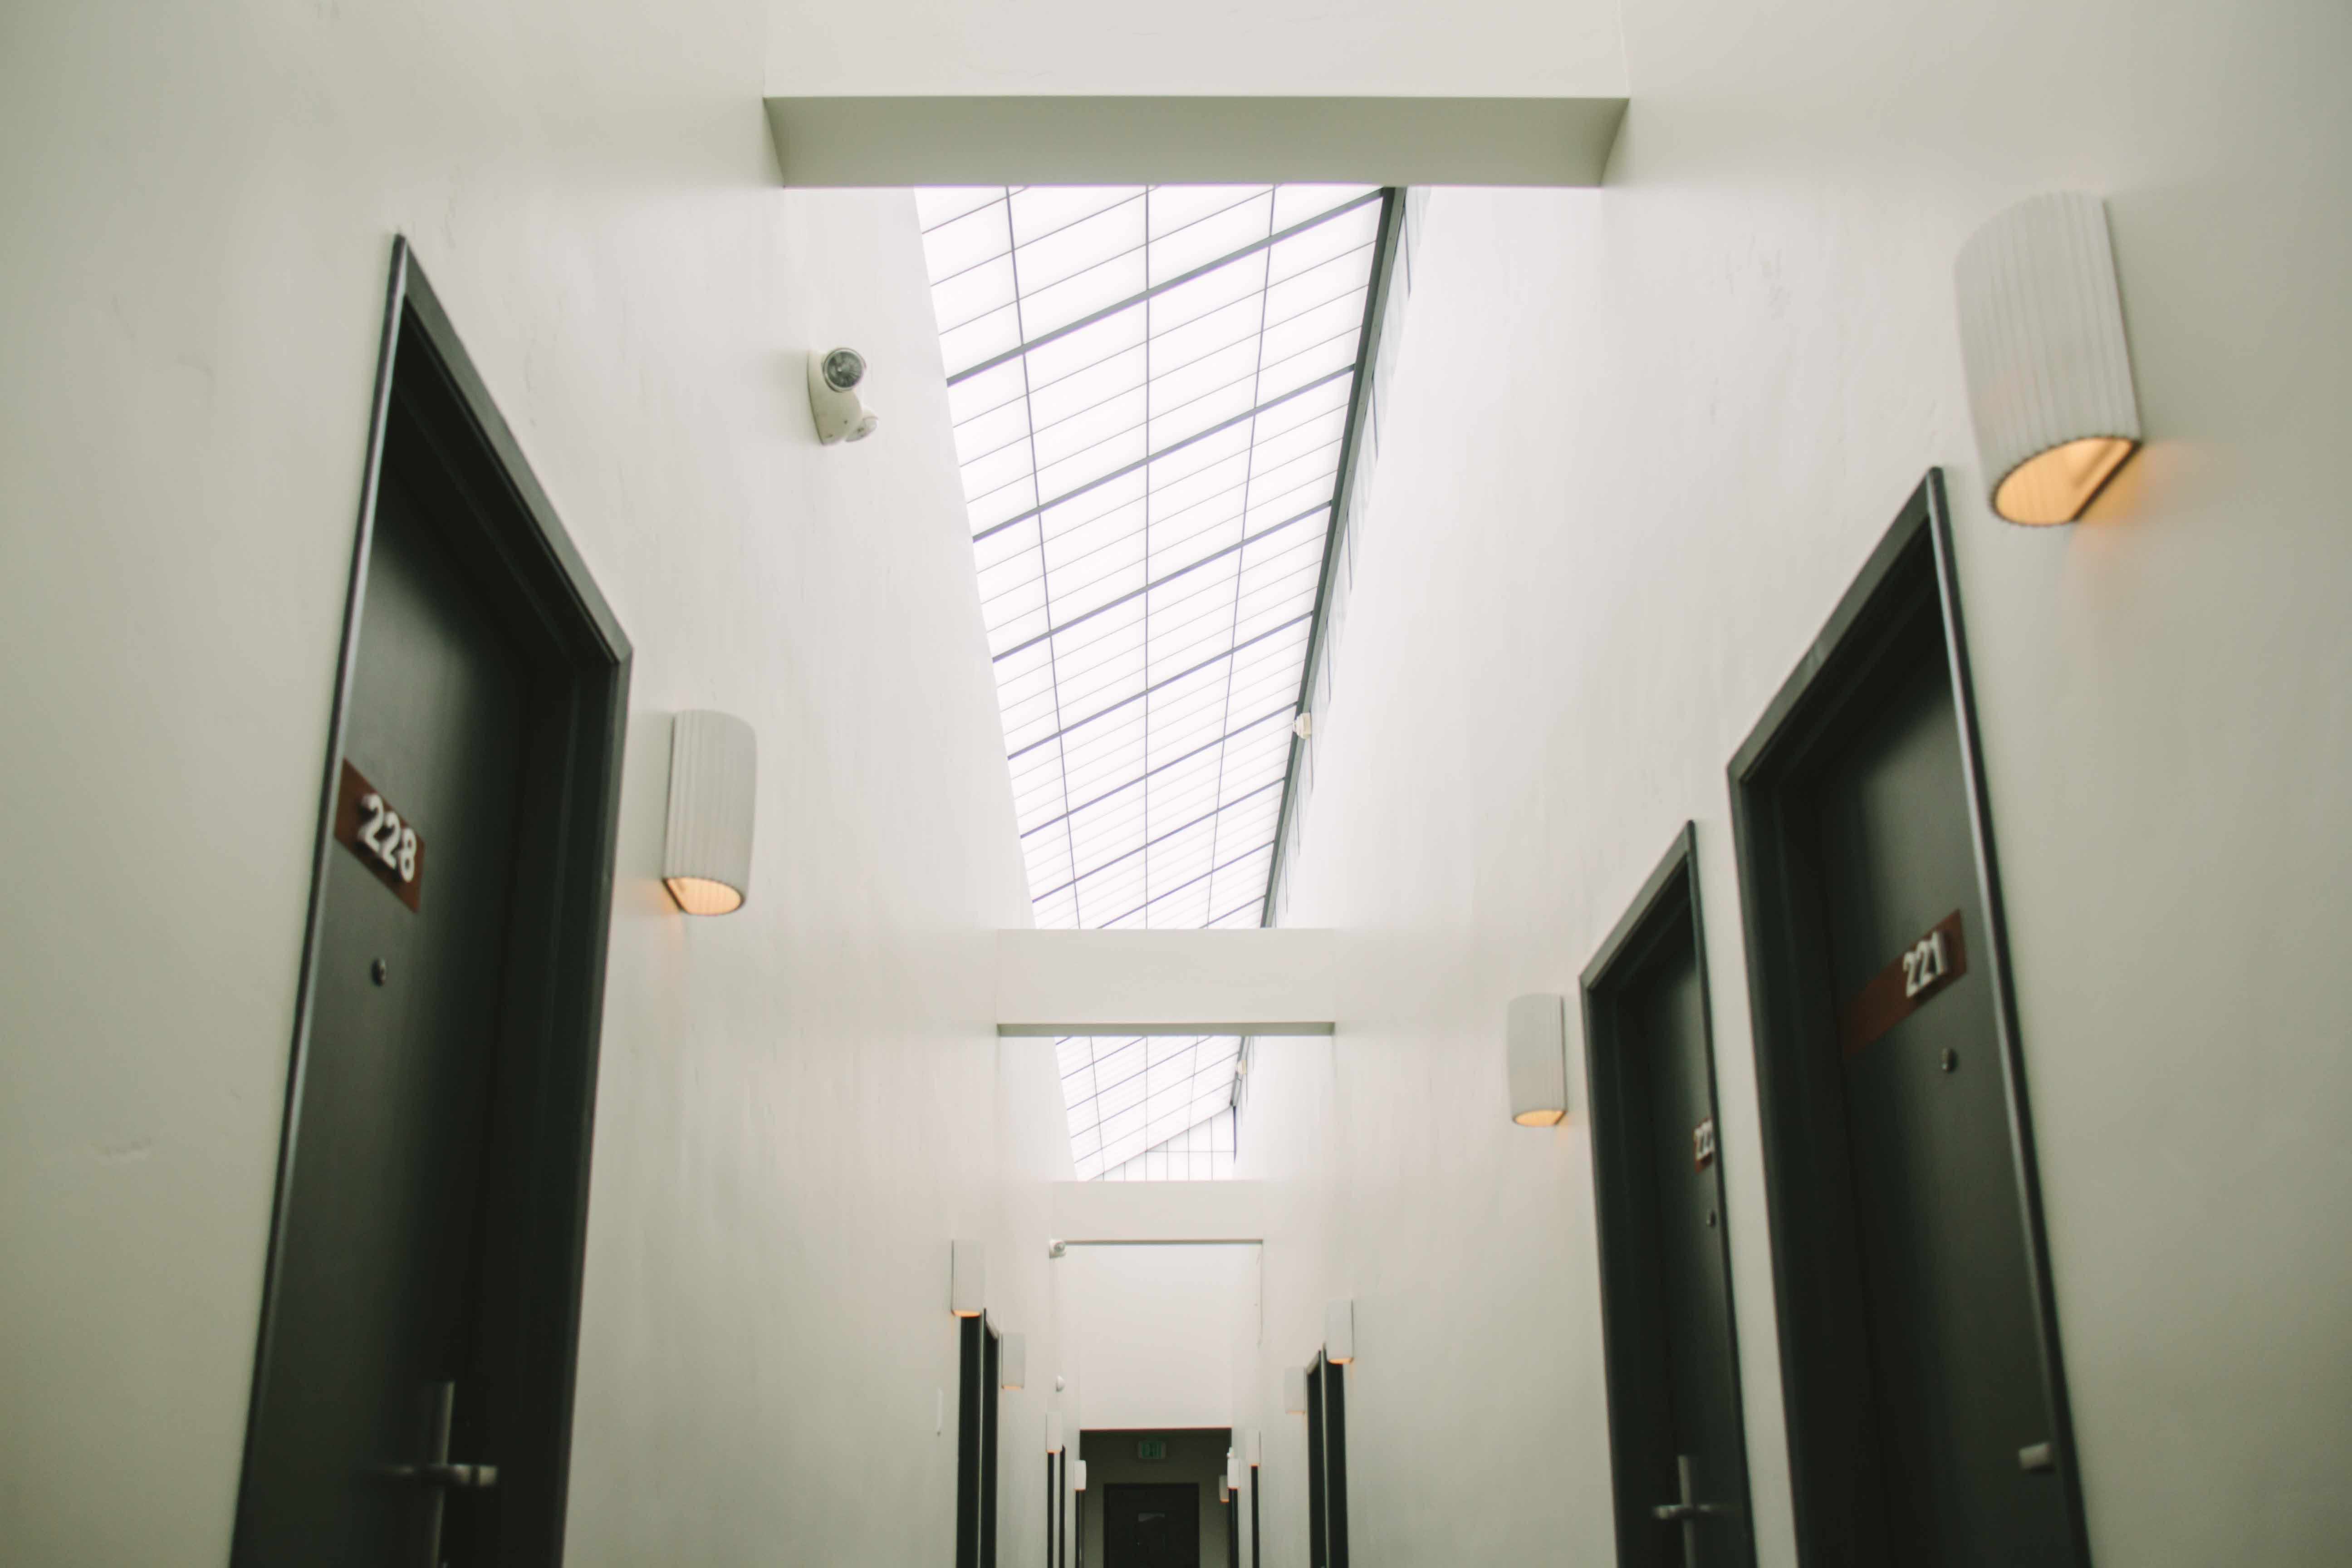 Interior Room Hallway